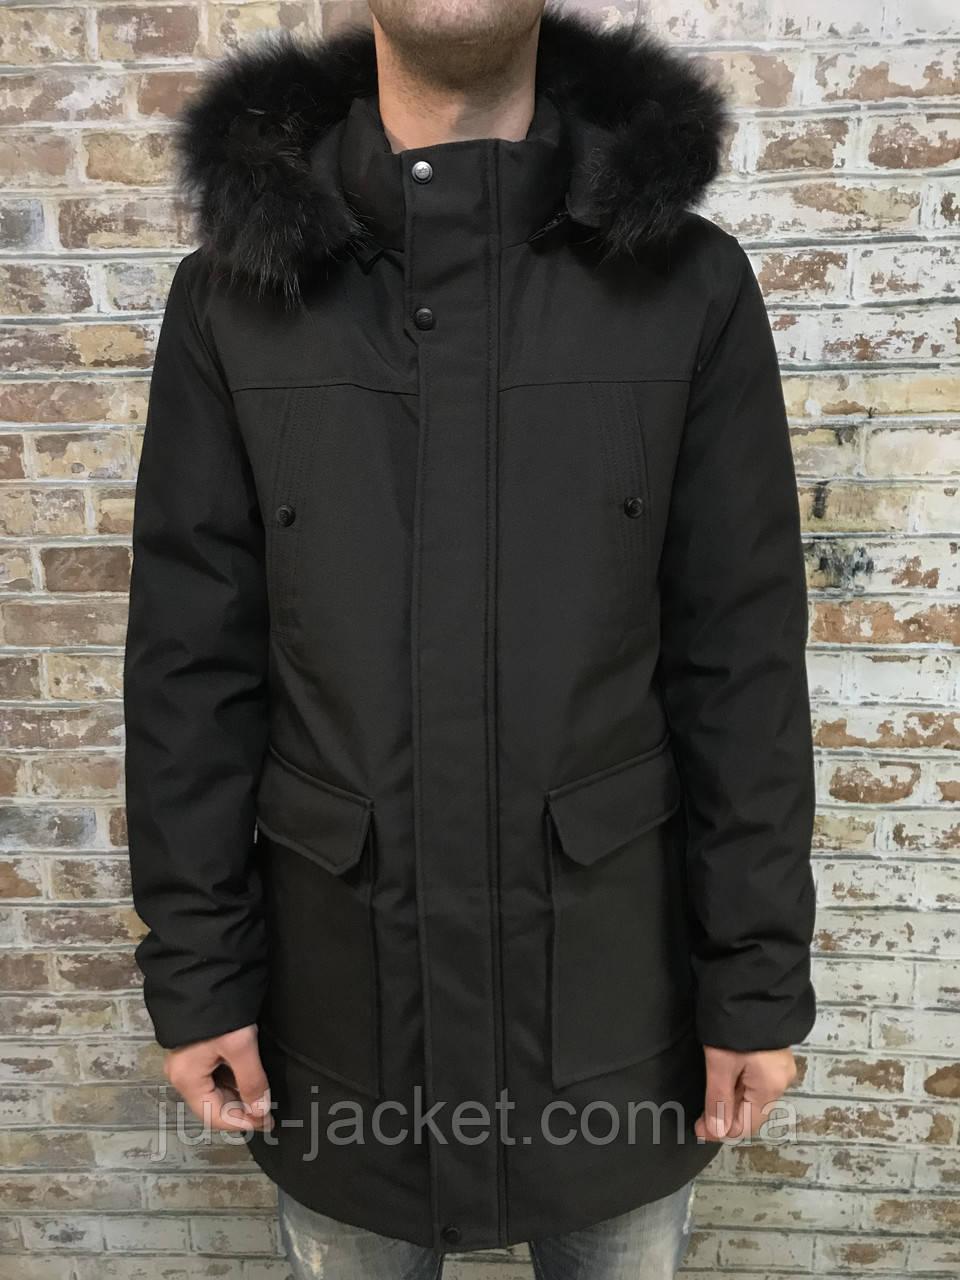 Зимняя мужская куртка 6011  продажа 4f1d1fd066a81